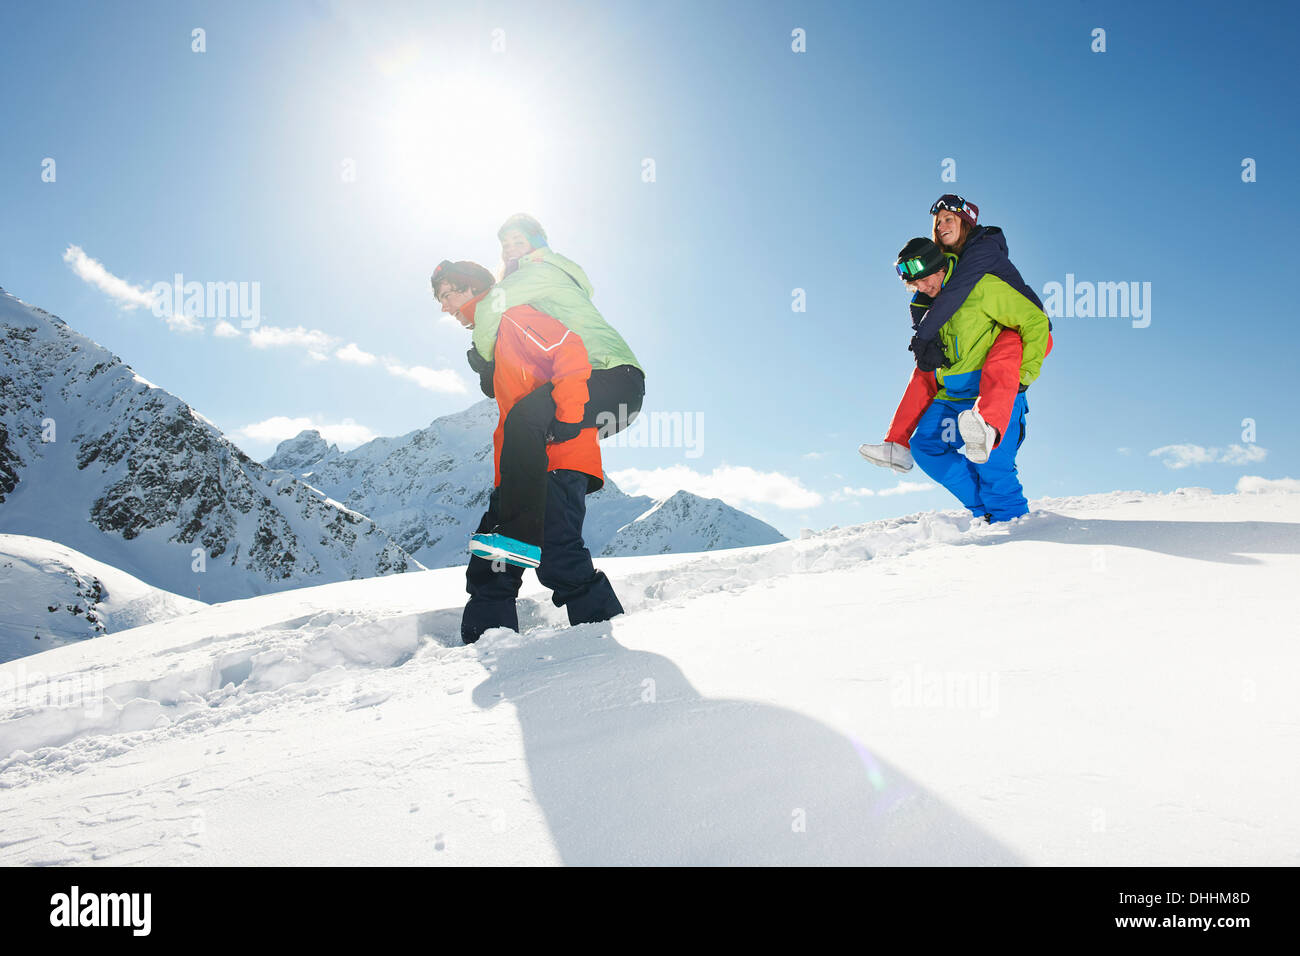 Friends giving piggy backs in snow, Kuhtai, Austria - Stock Image